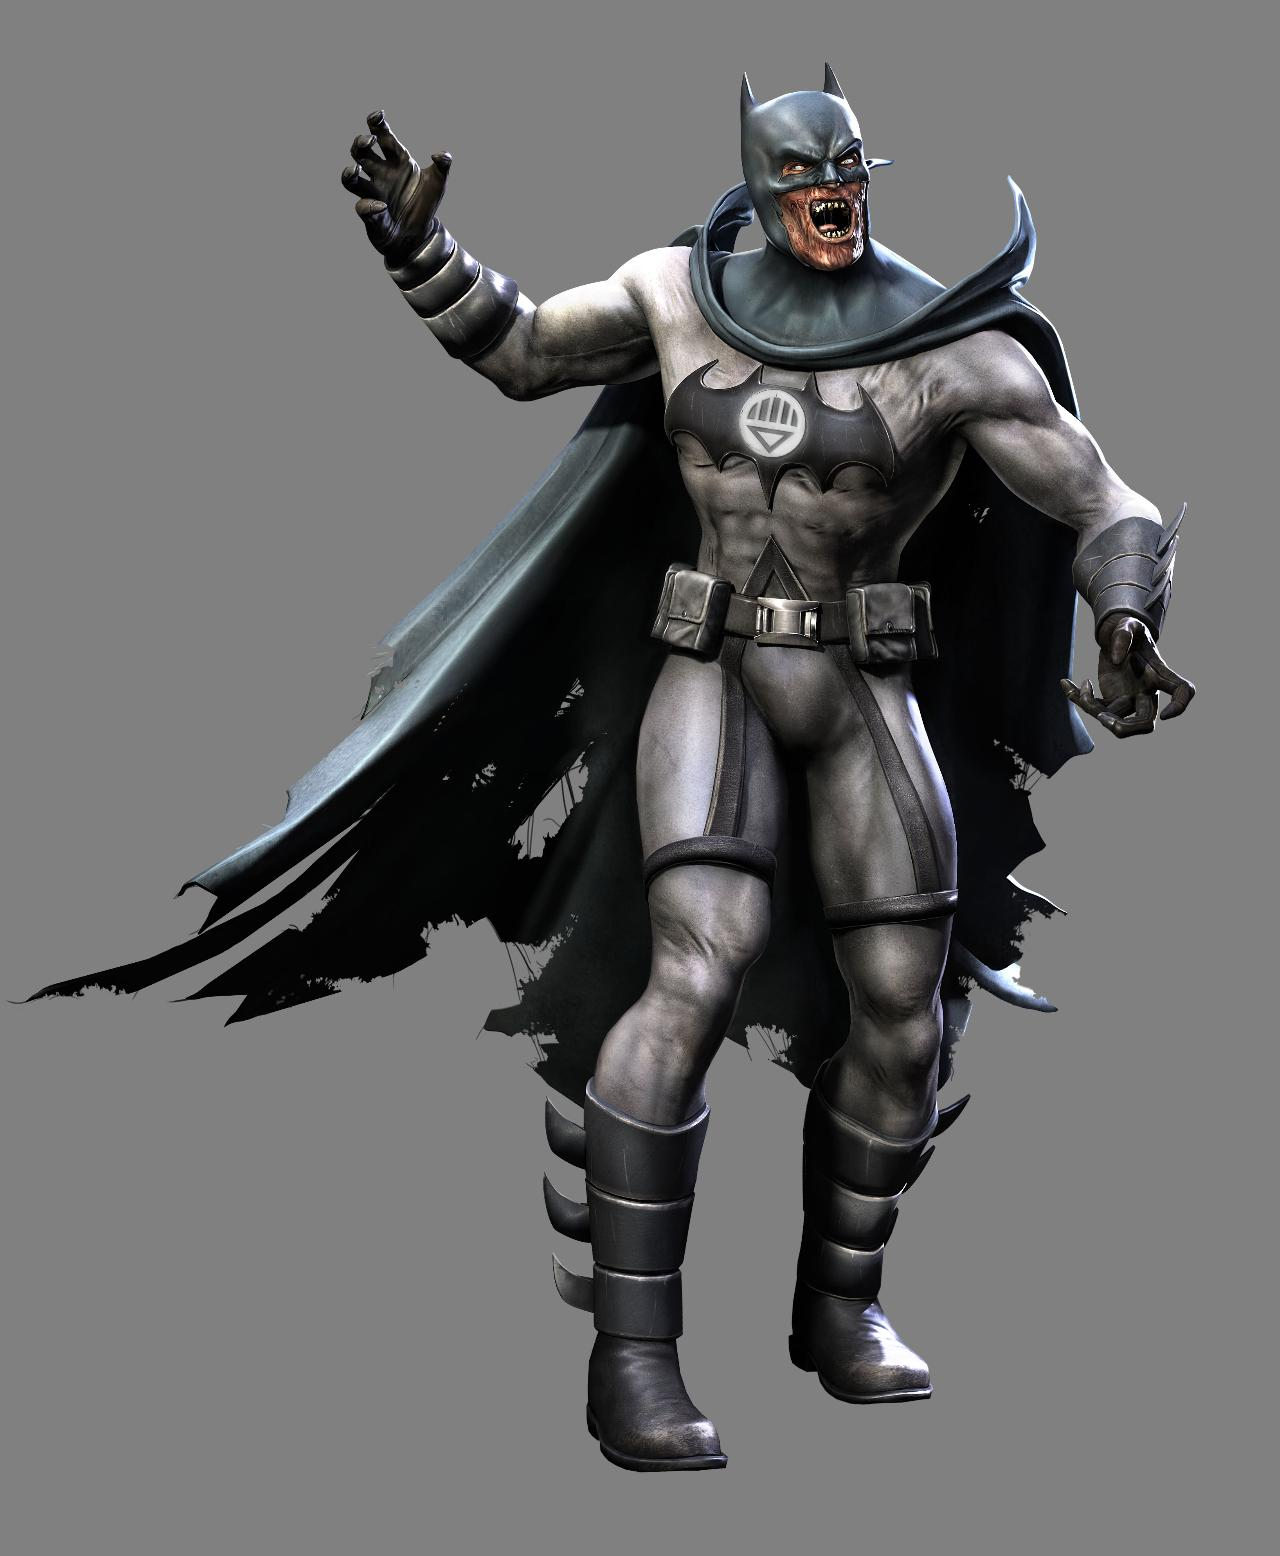 """Injustice: Gods Among Us"": Blackest Night DLC Trailer ... White Lantern Batman Arkham Origins"